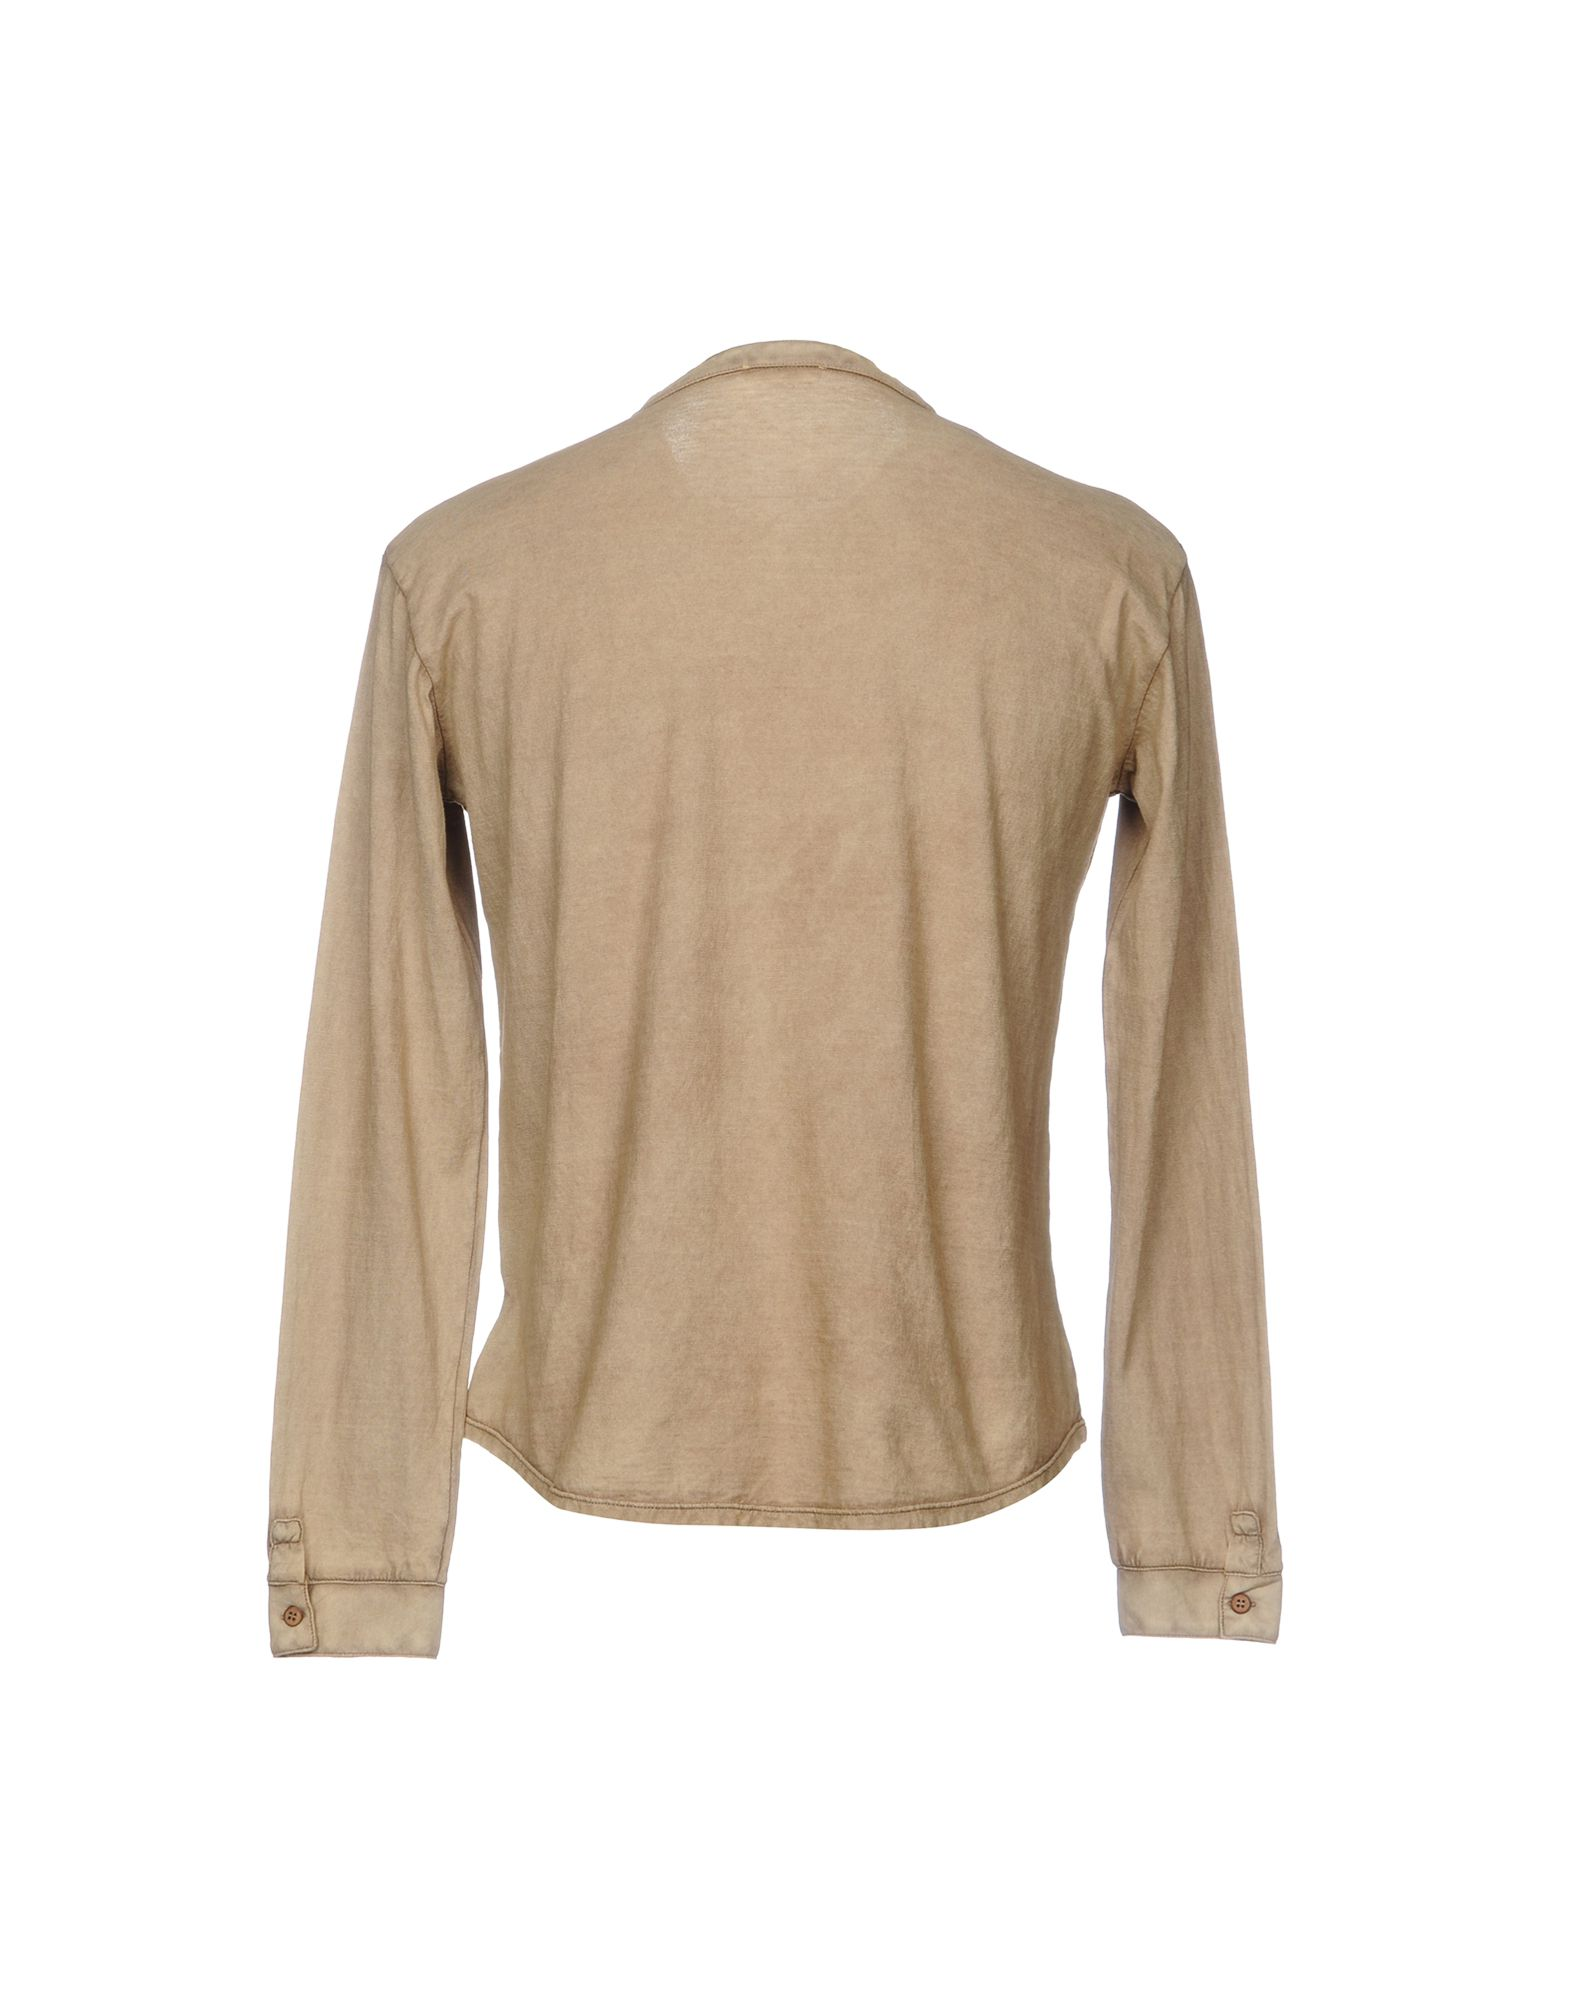 A buon mercato - A buon mercato T-Shirt ..,Beaucoup Uomo - mercato 39823739DR 71fcd6